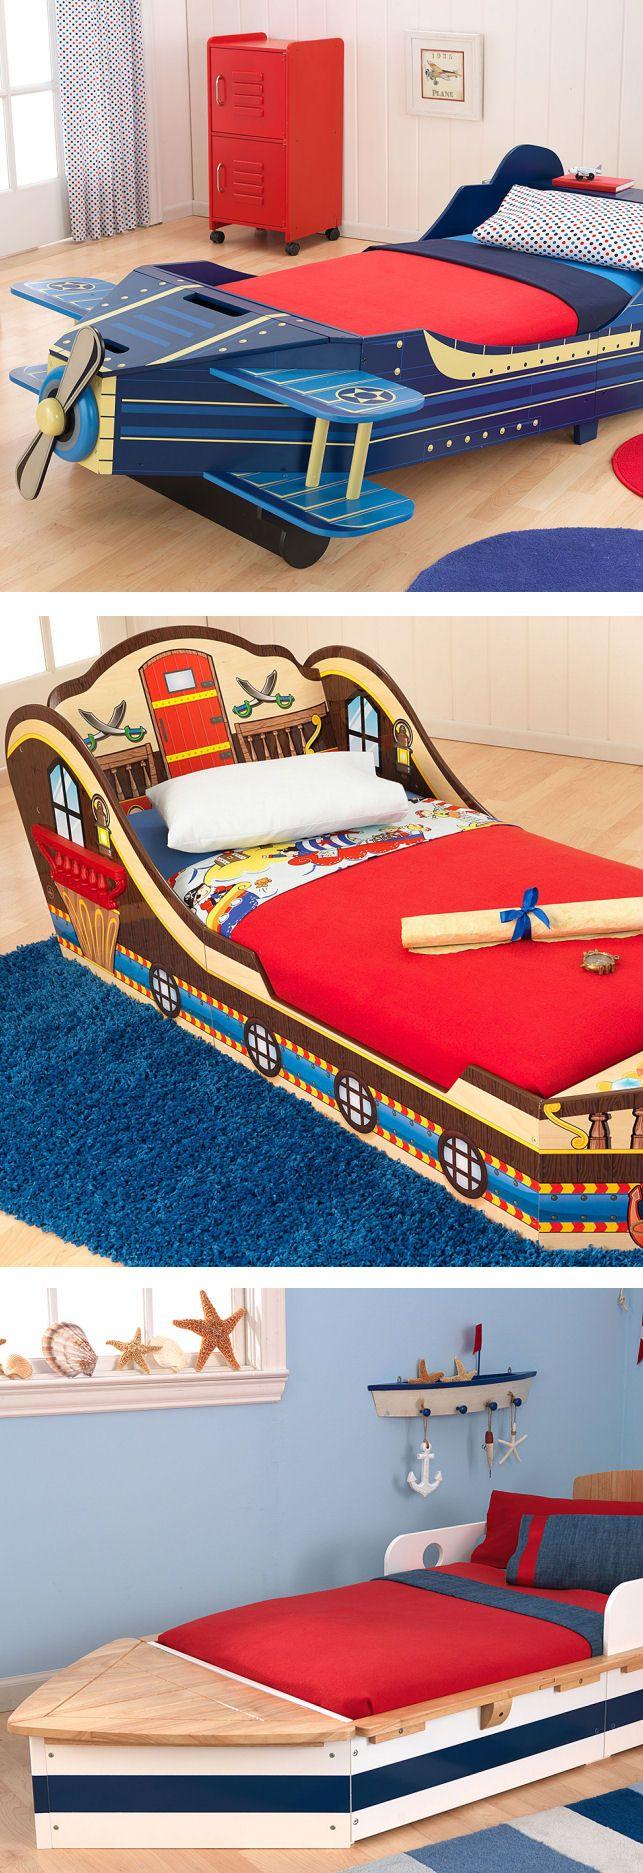 cUte Kids Twin Bed // Bedroom Furniture airplane pirate